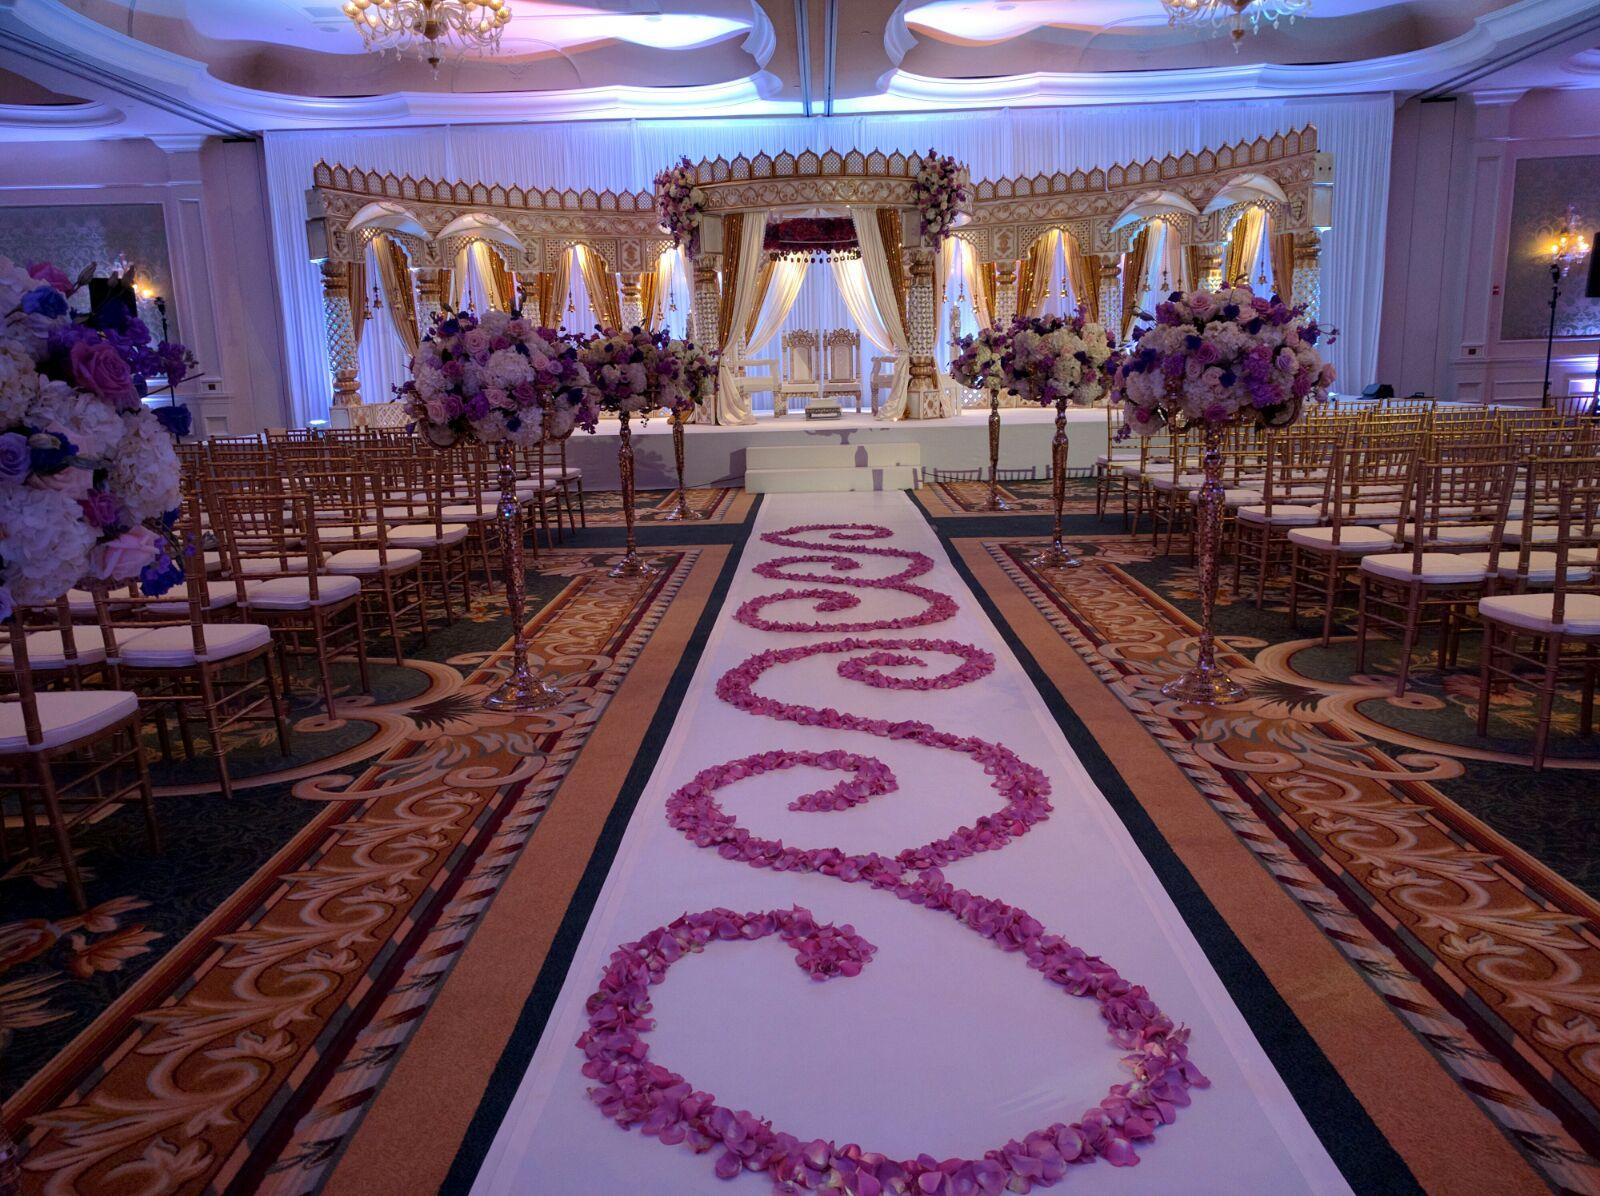 https://weddingmandaps.us/assets/wedding-stage-mandaps-themes.jpg